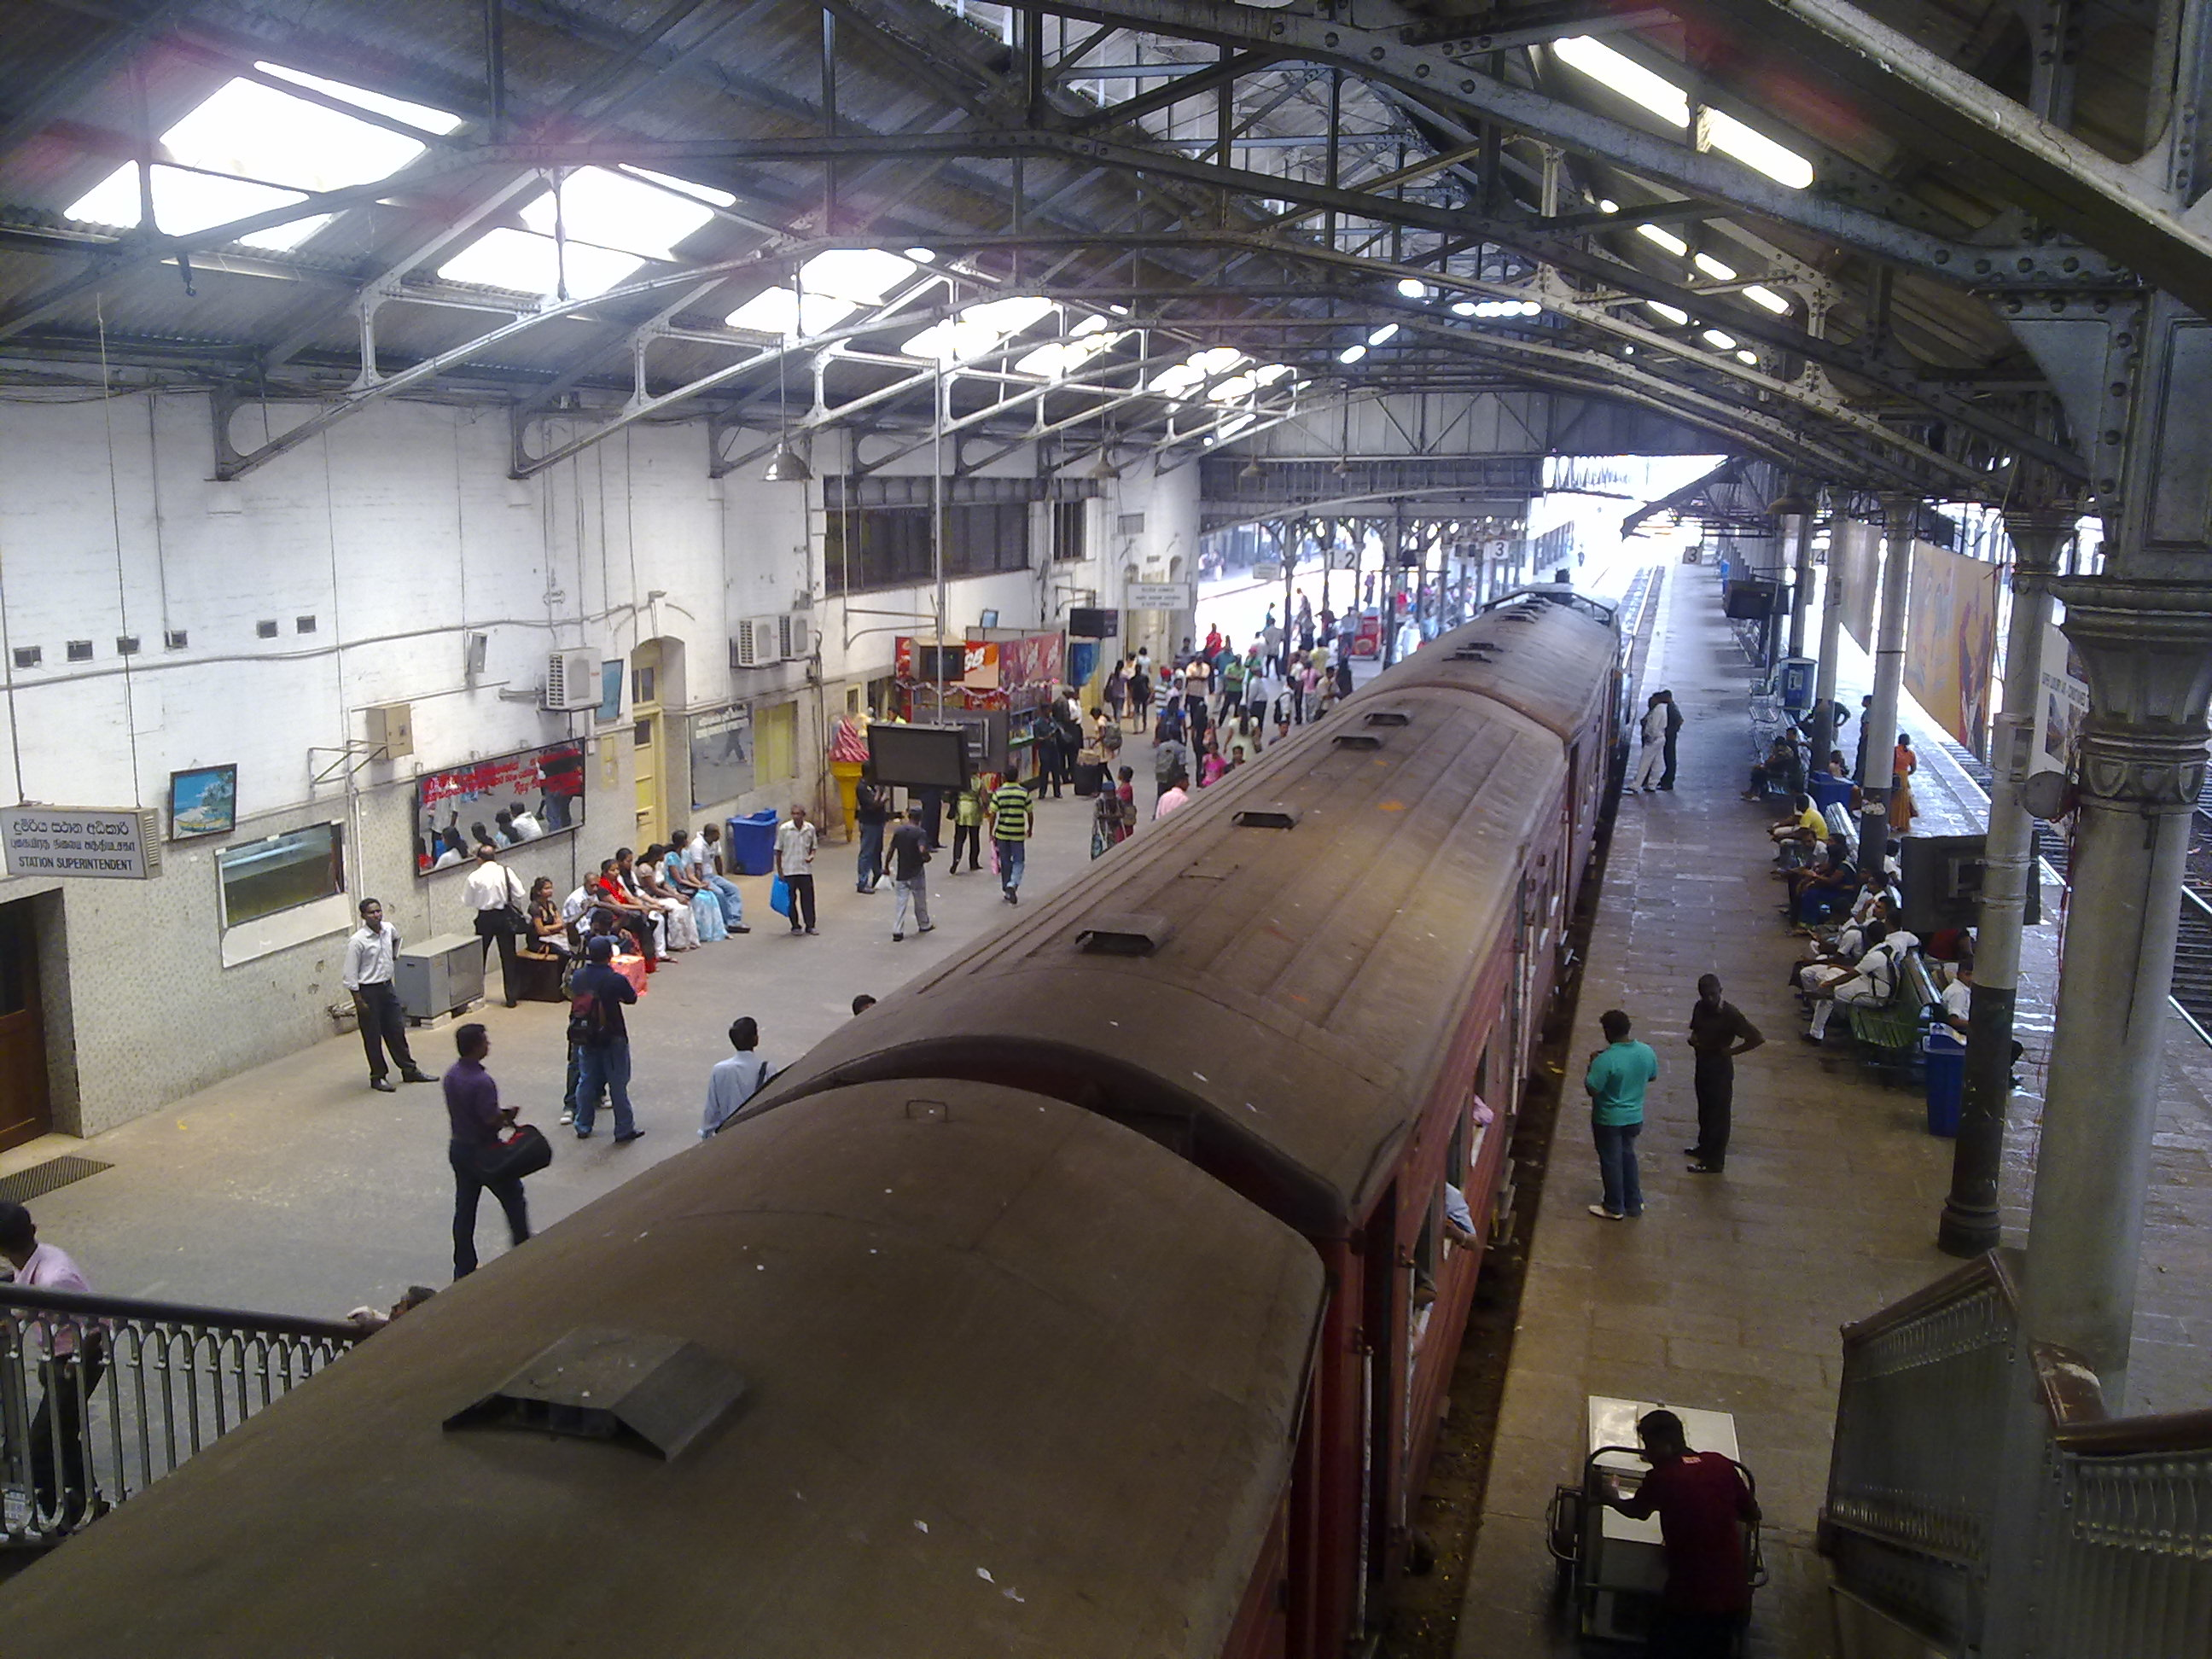 Uncategorized sale home sri lanka ikman ratmalana - Srilanka Fort Railway Station